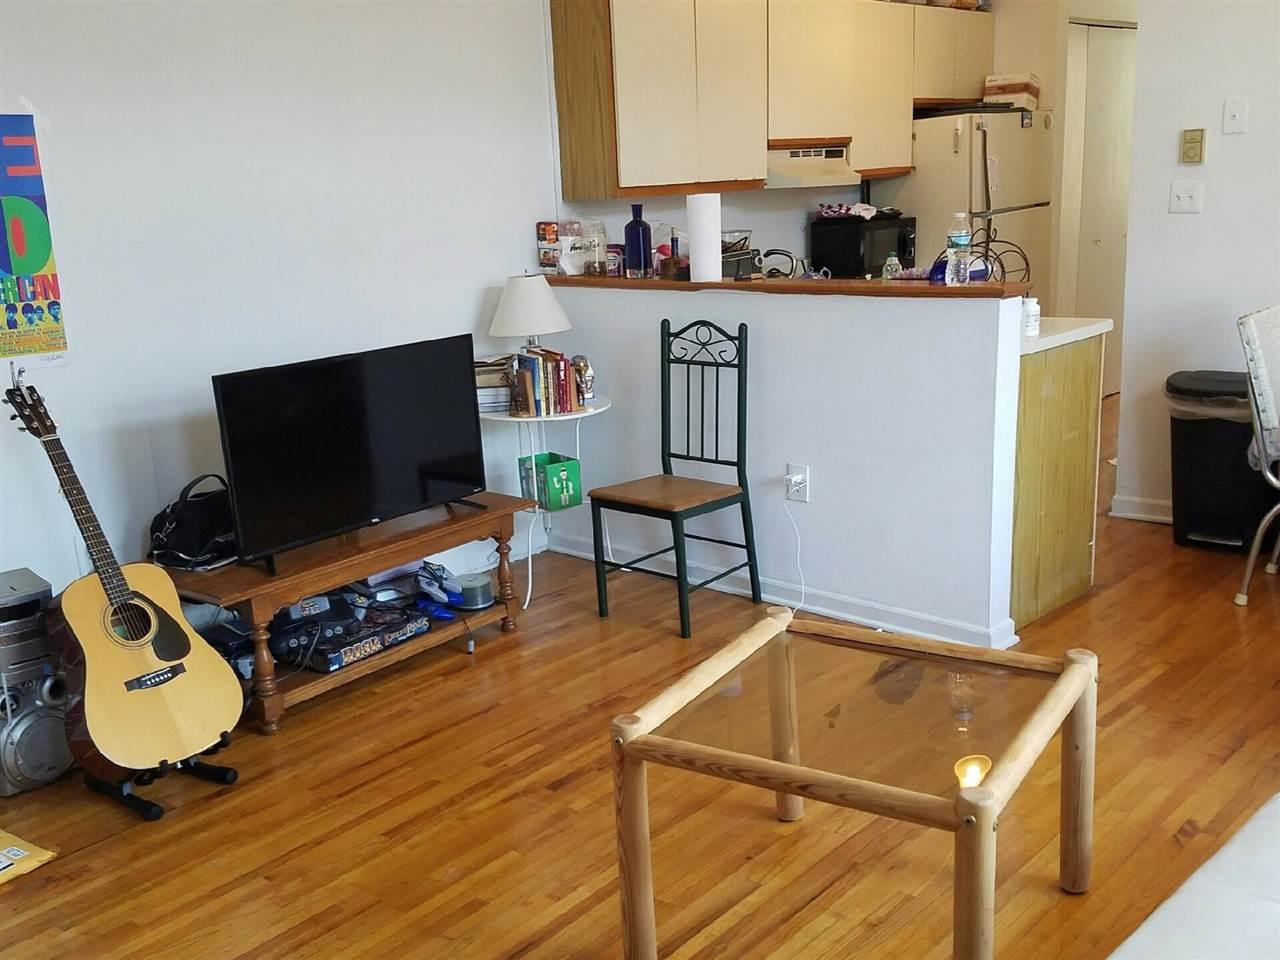 533 MONROE ST 5b  Hoboken  NJ 07030. HOBOKEN 2 BEDROOM APARTMENTS FOR RENT